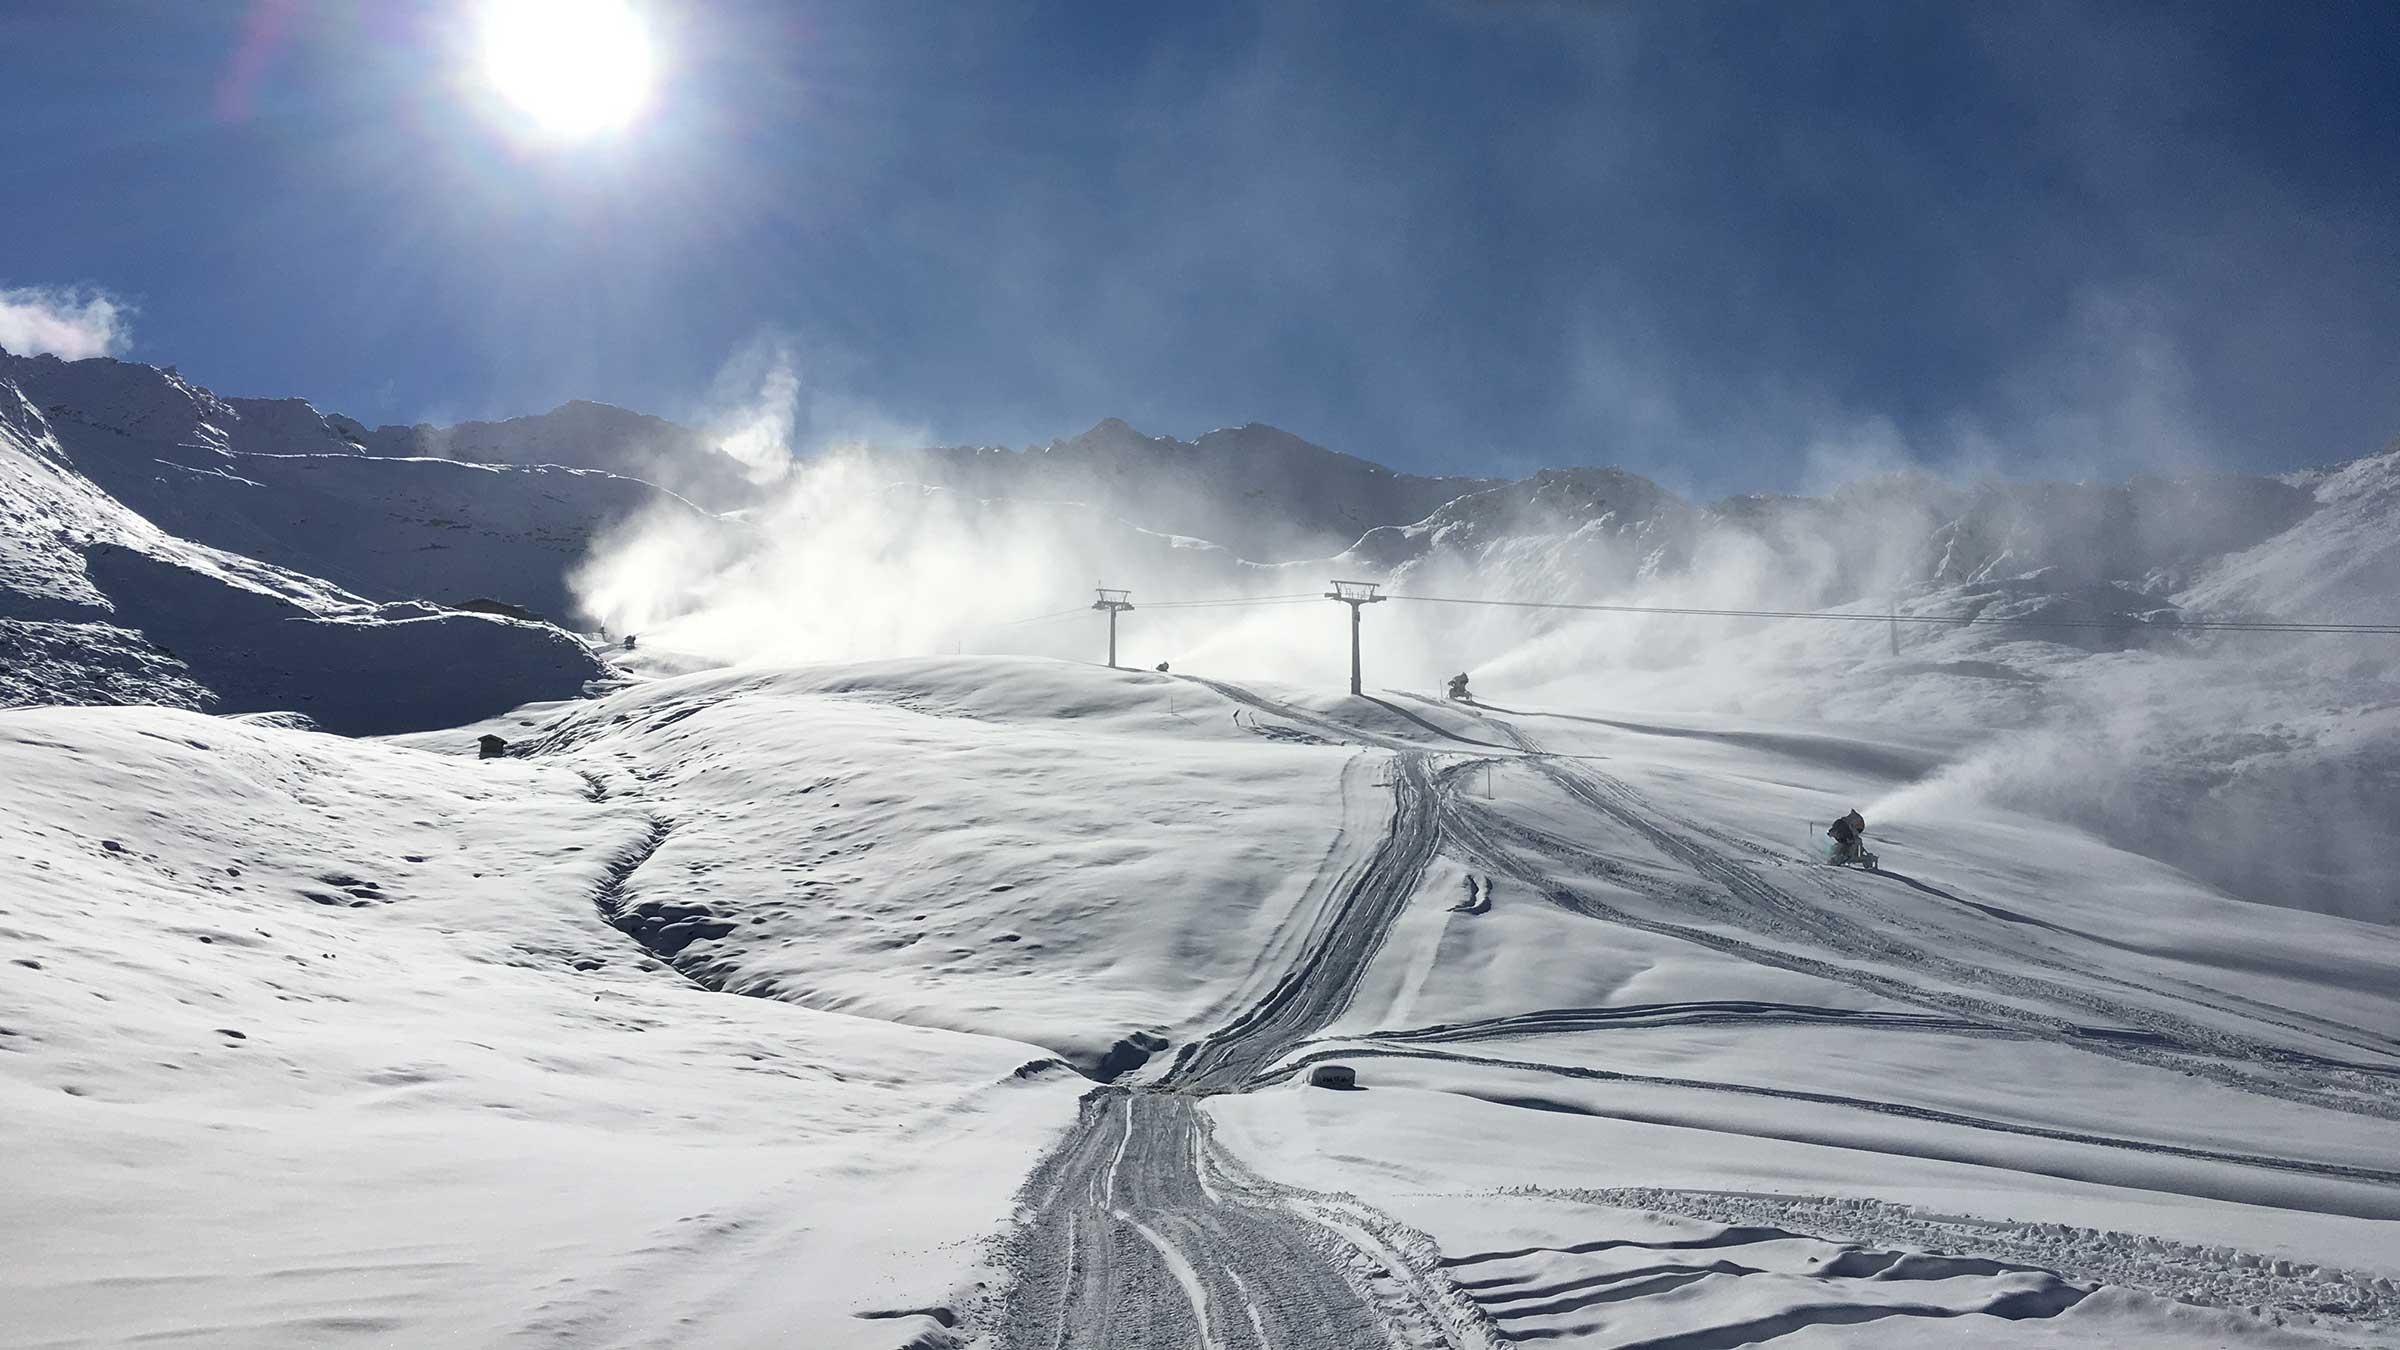 Schneekanonen im Einsatz - Obergurgl-Hochgurgl, Ötztal, Tirol